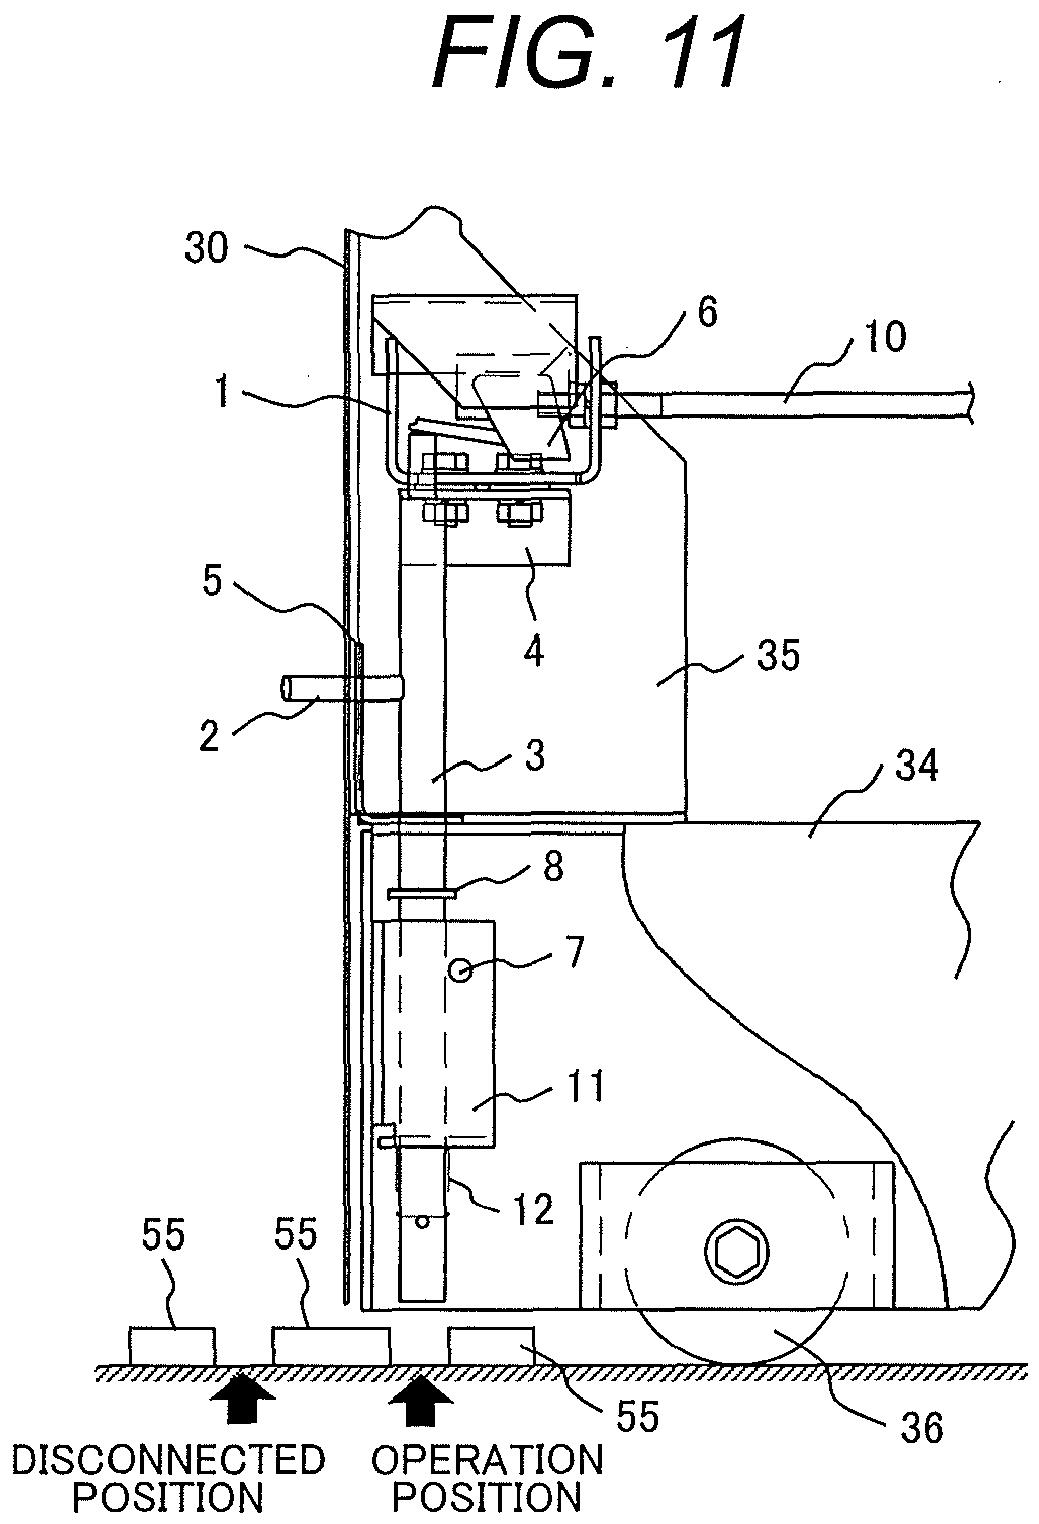 2 Circuit Breaker Box